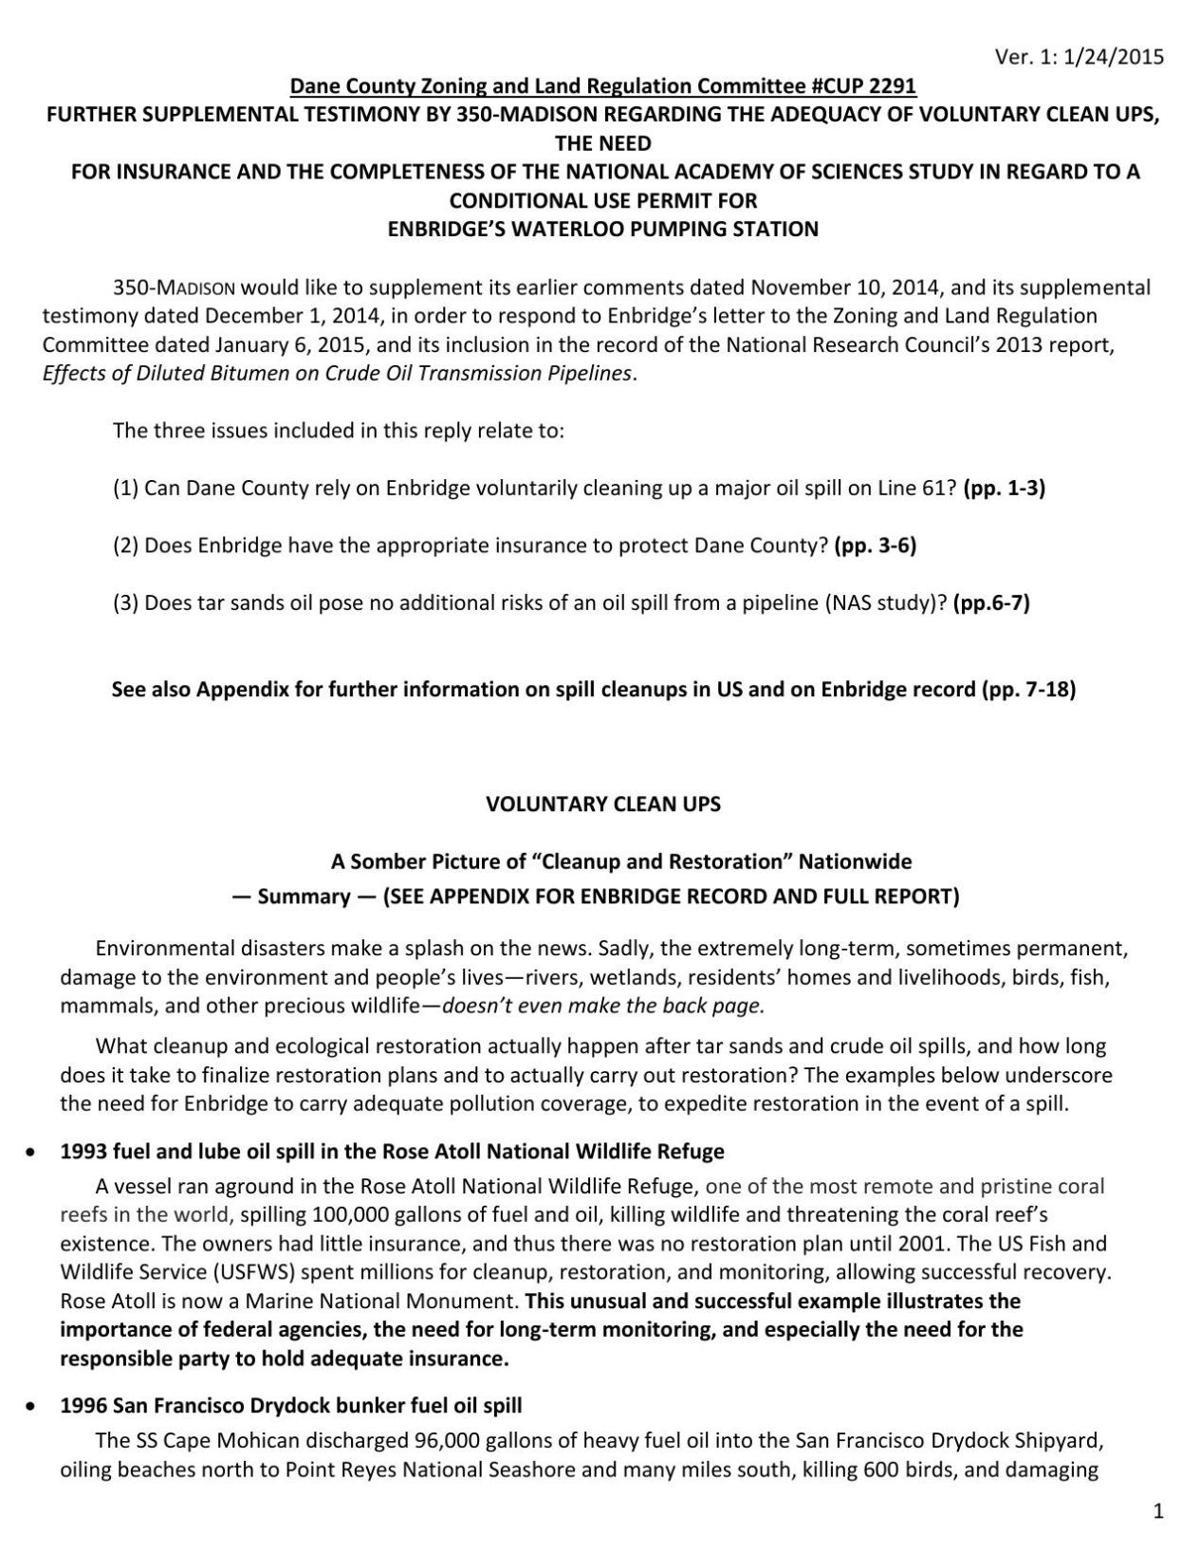 350.org 1/24/15 supplemental testimony